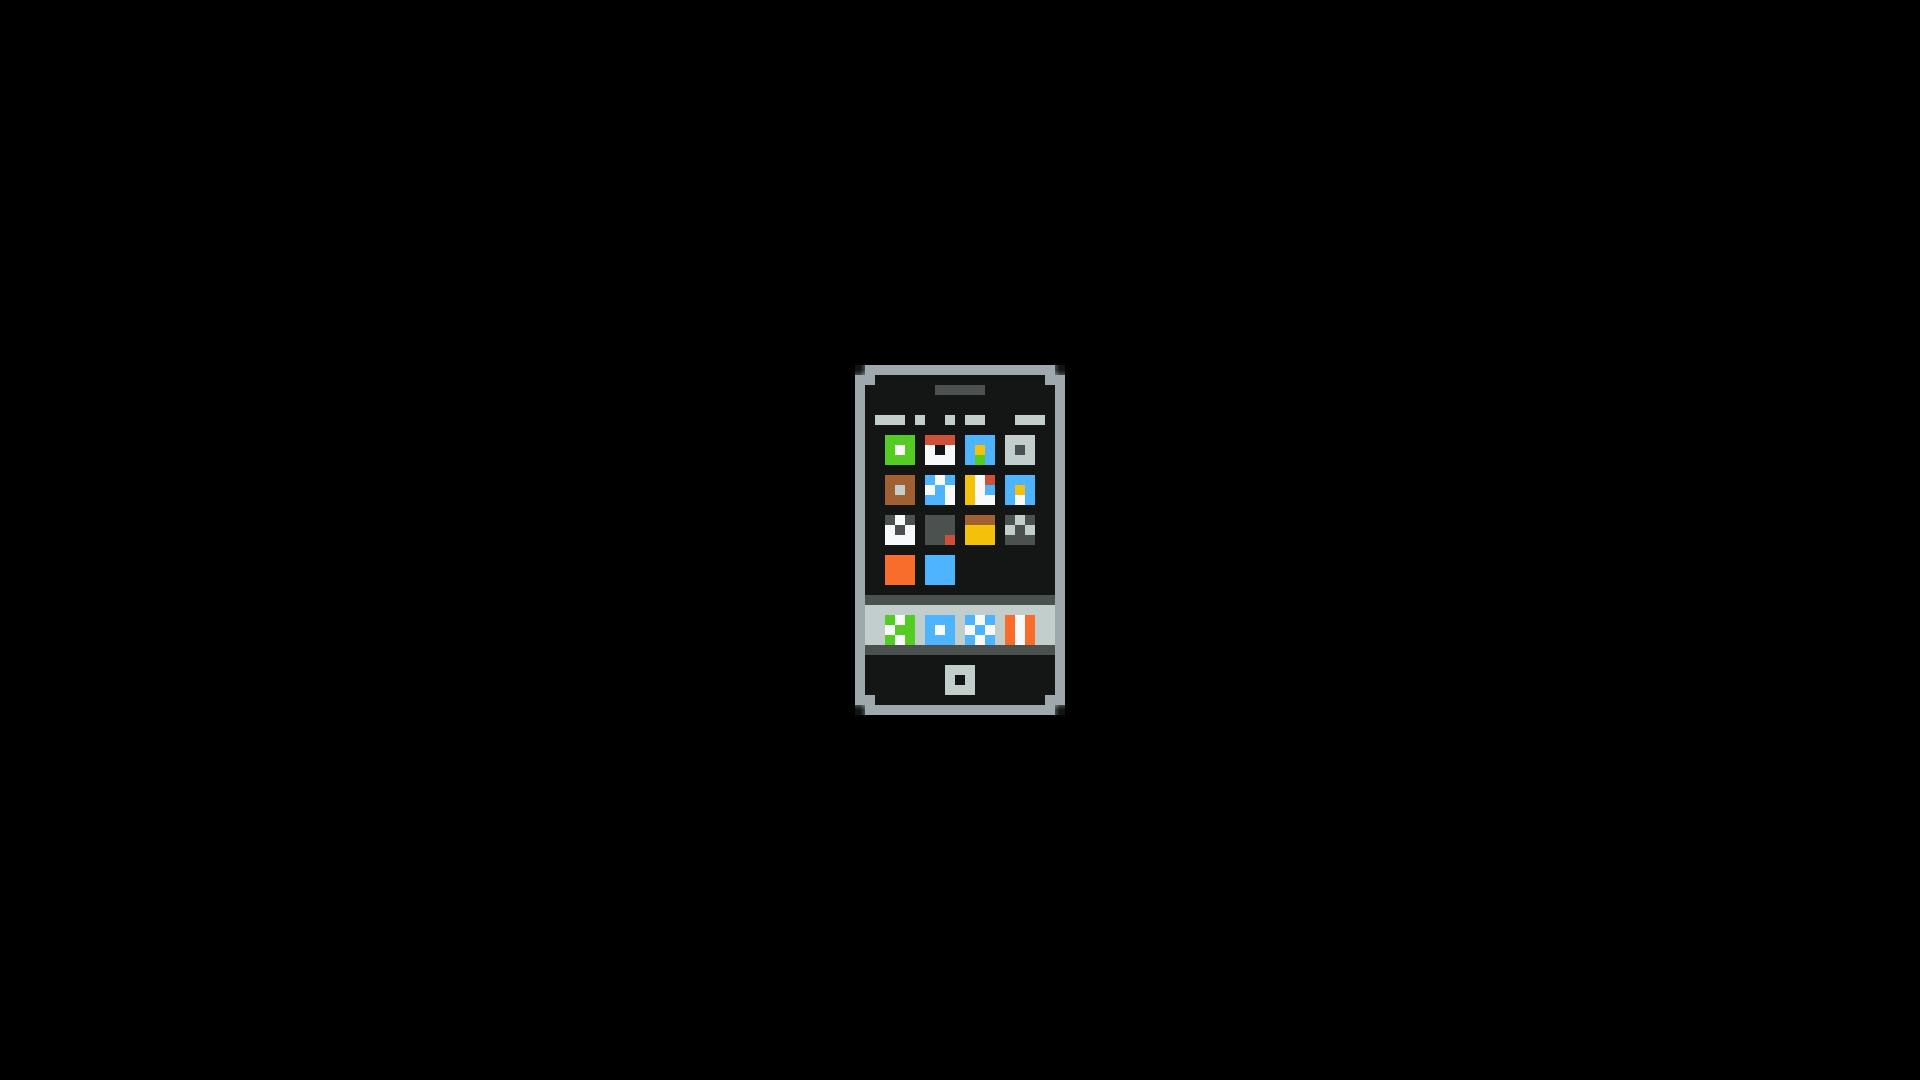 Wallpaper 1920x1080 Px Iphone Pixel Art Pixels Telephone